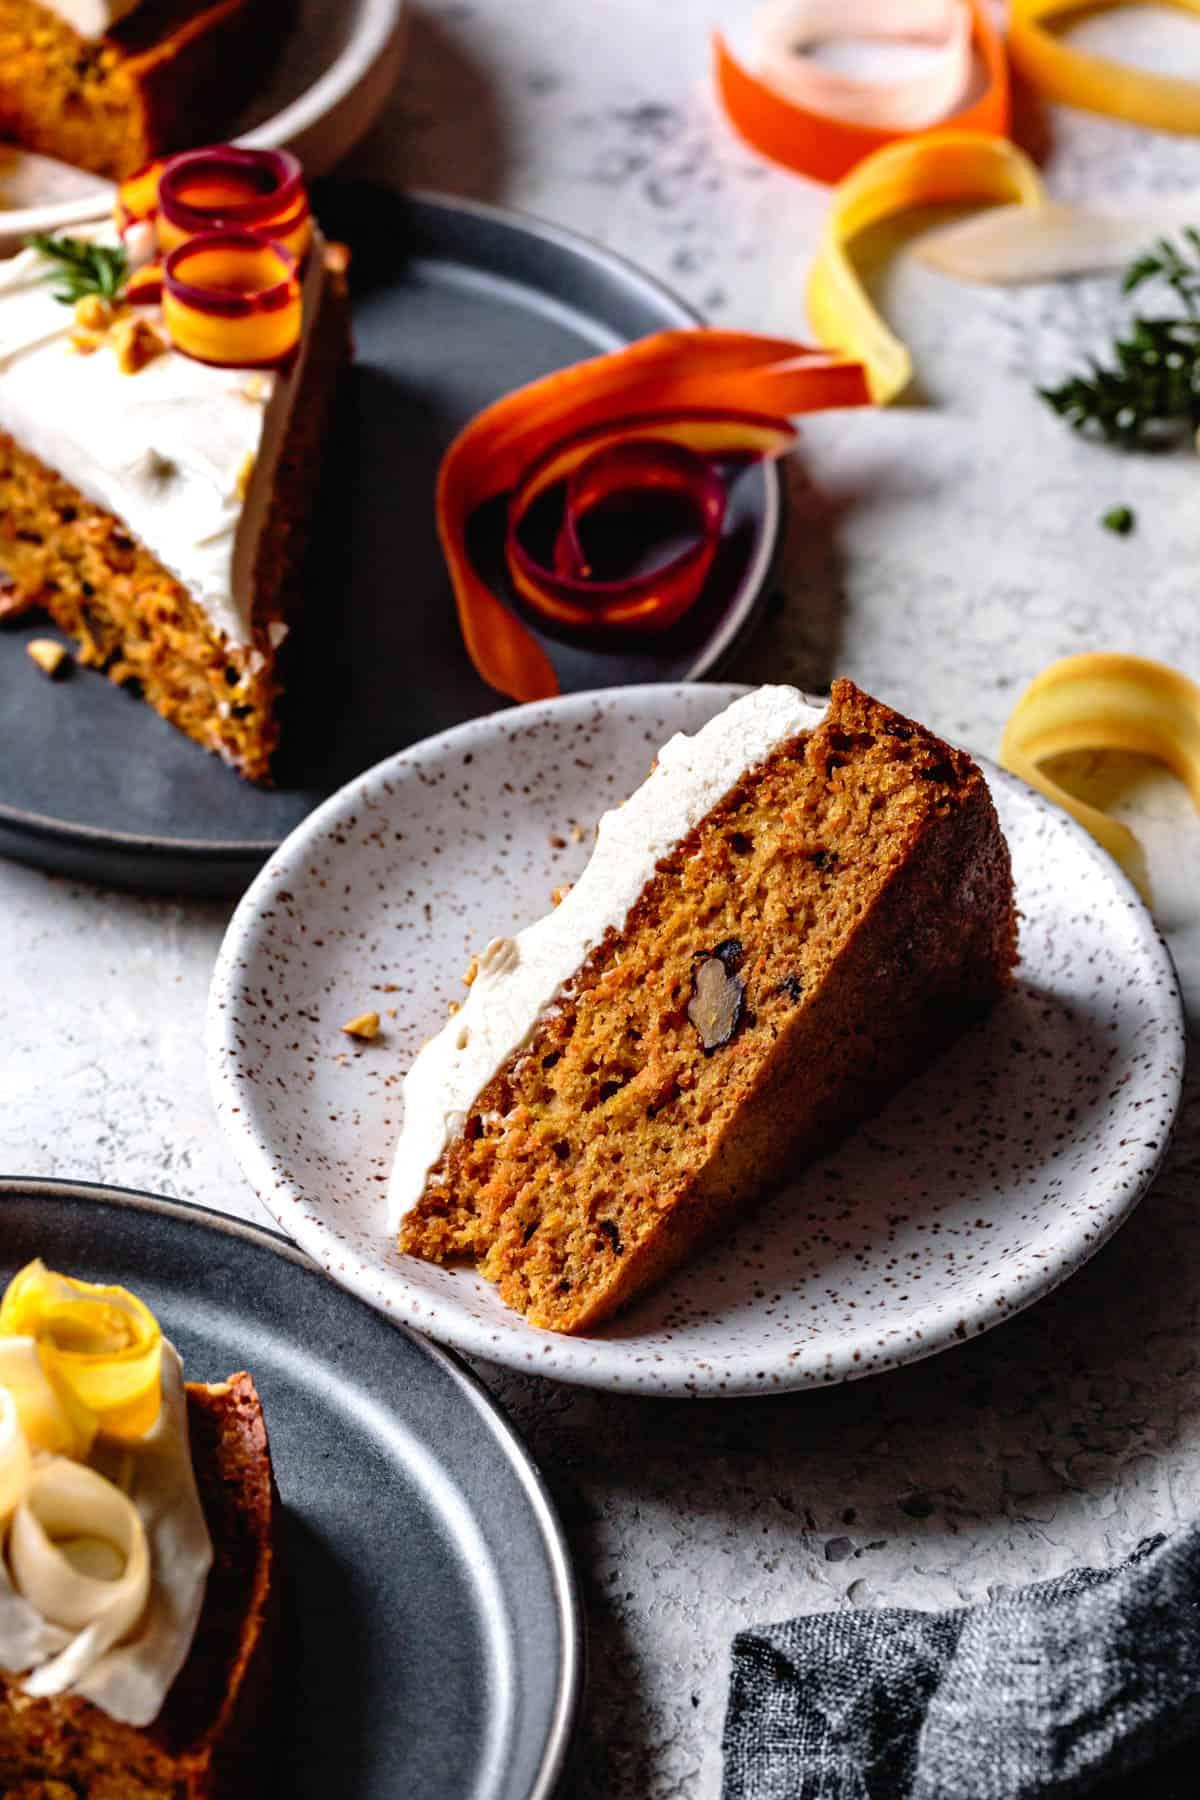 slice of Dairy Free Gluten Free Carrot Cake